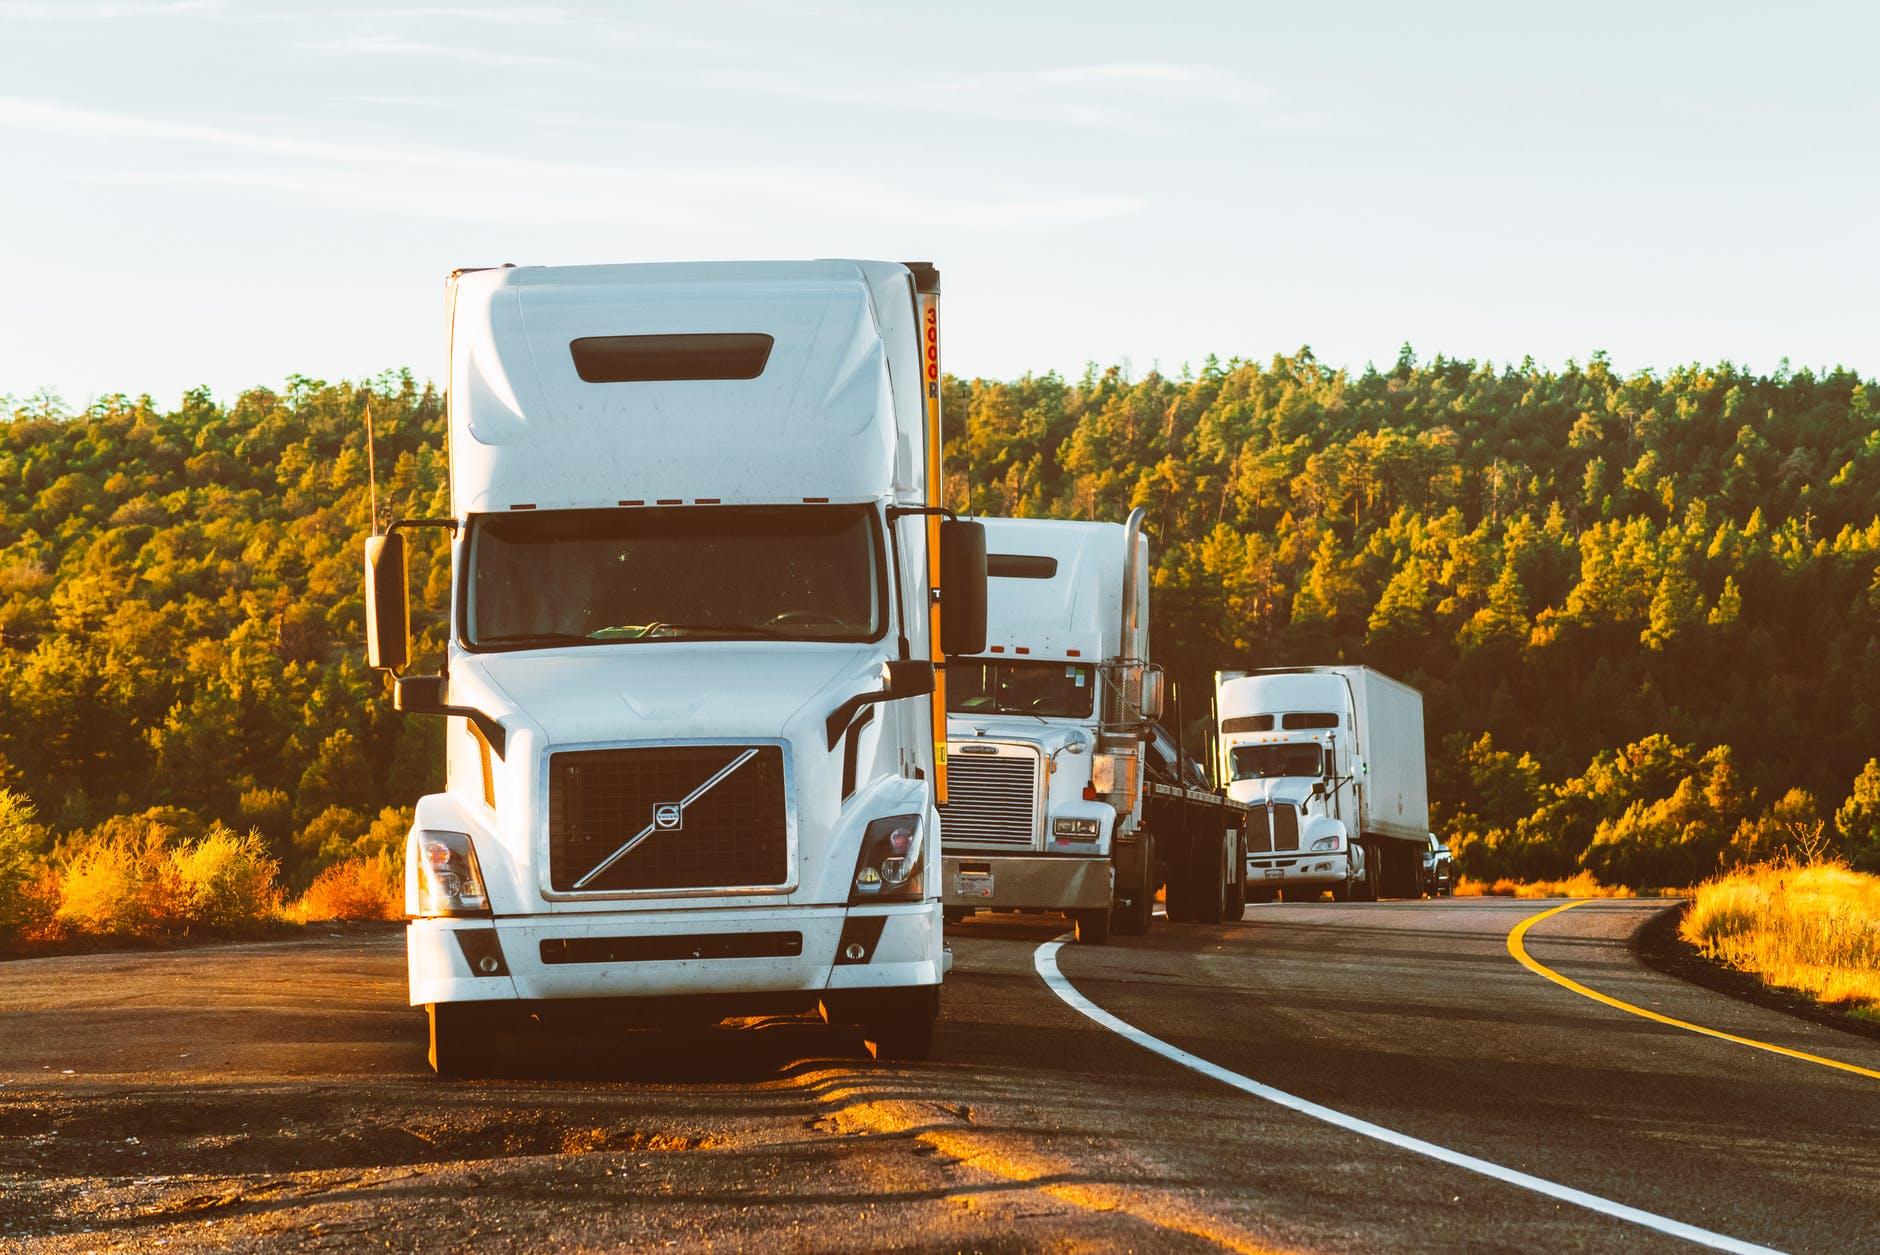 trucking insurance aseguranza para trucking seguro comercial aseguranza comercial commercial insurance